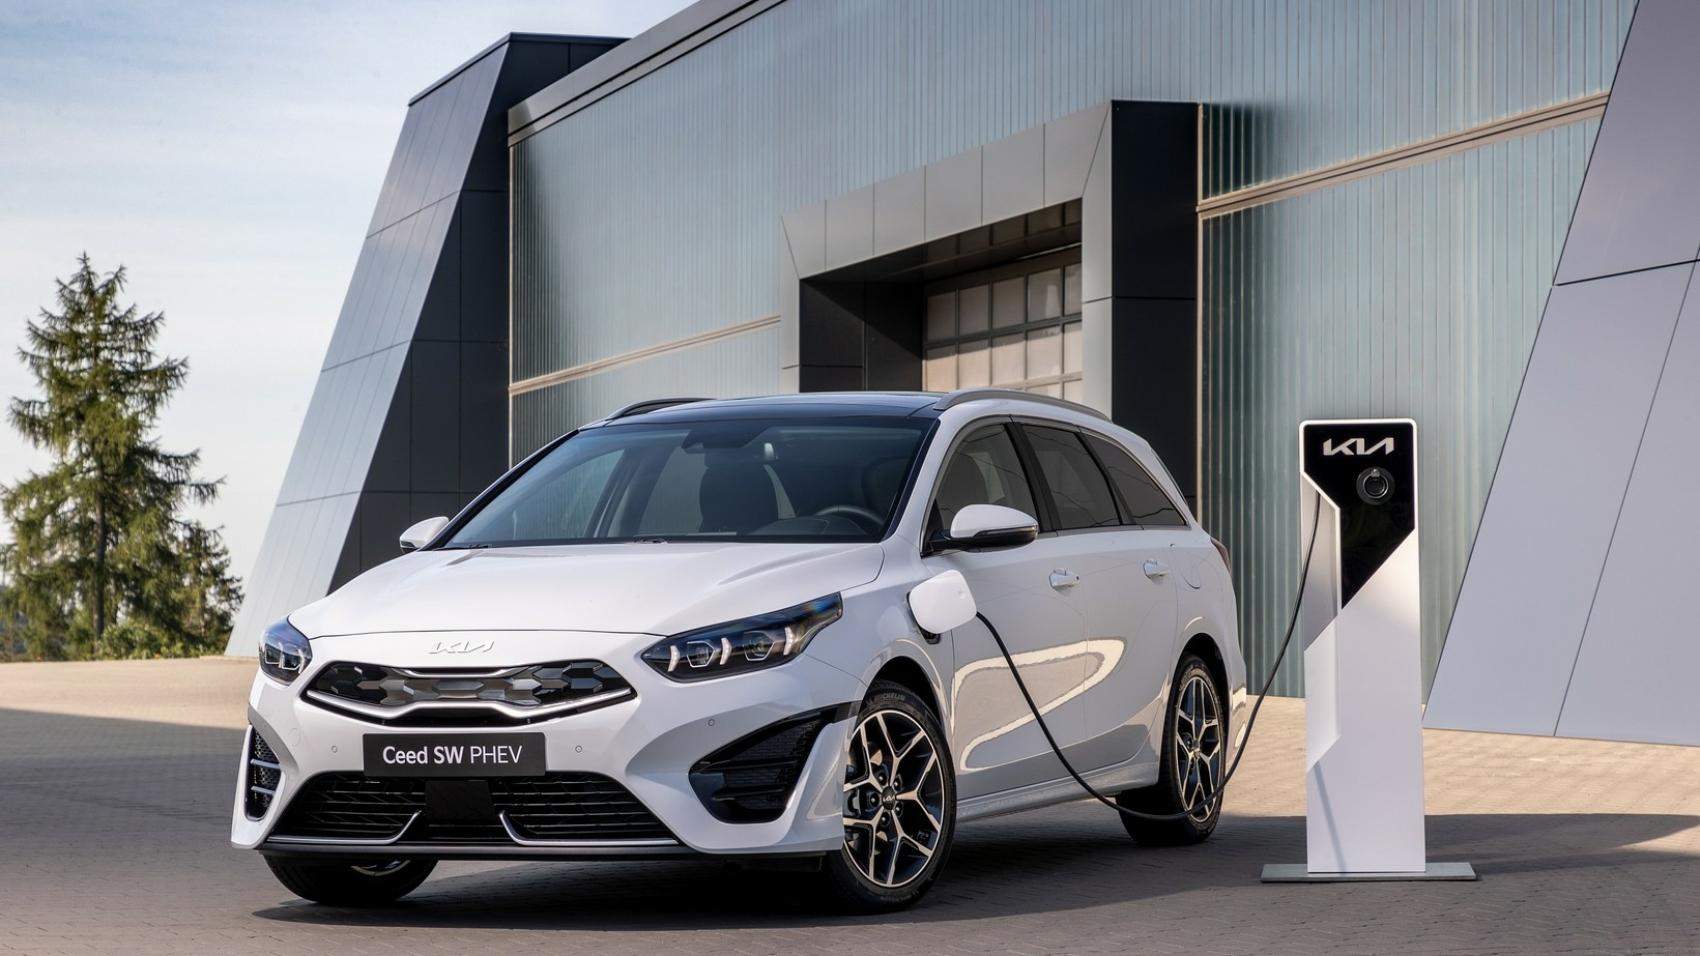 2022 Kia Ceed facelift